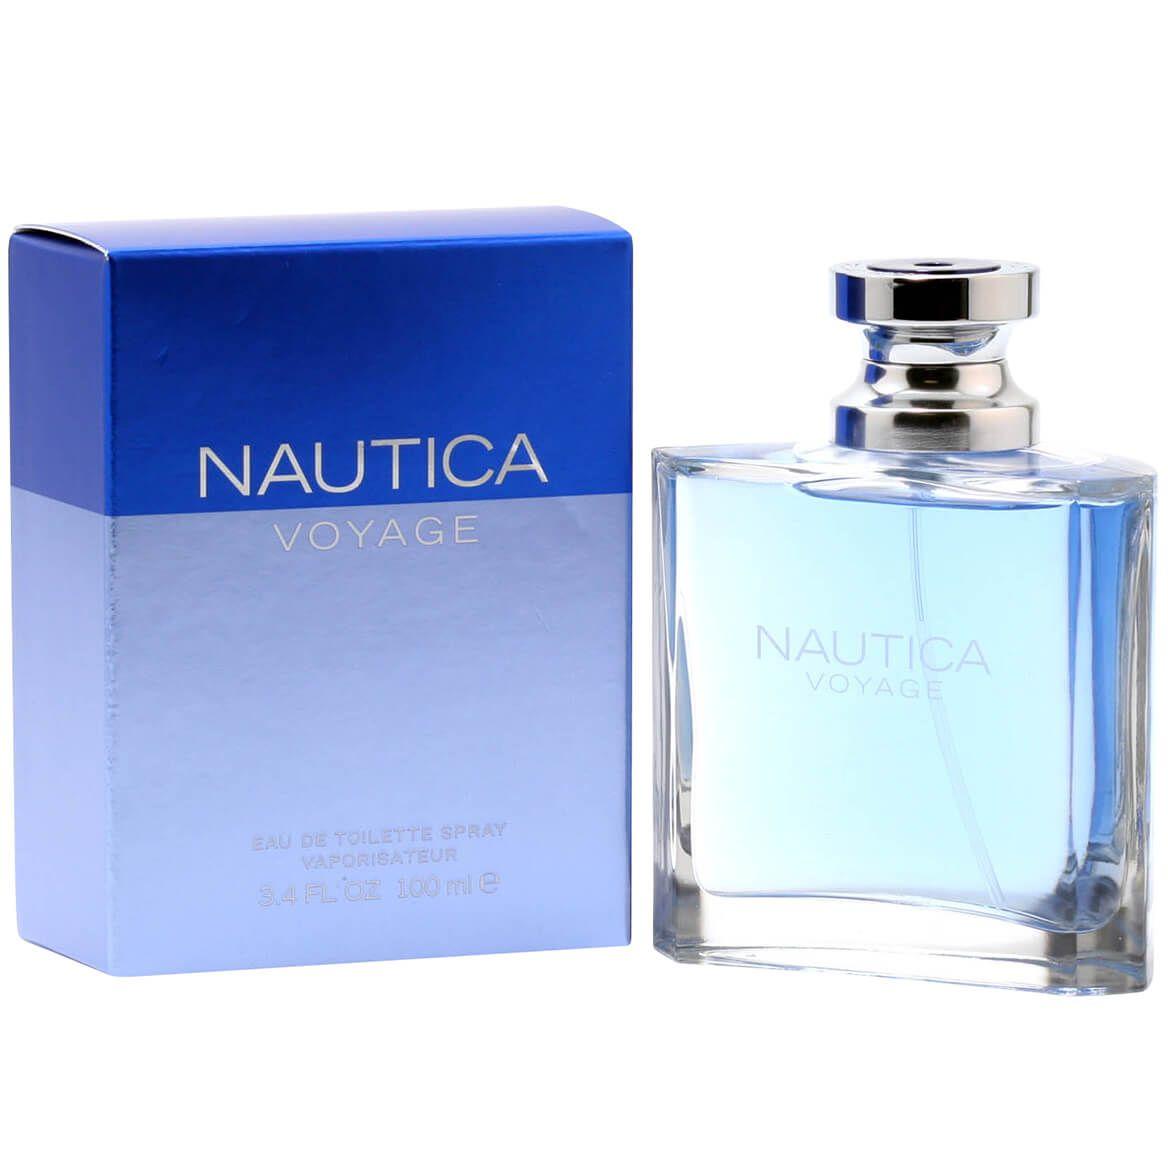 Nautica Voyage Men, EDT Spray 3.4oz-360300